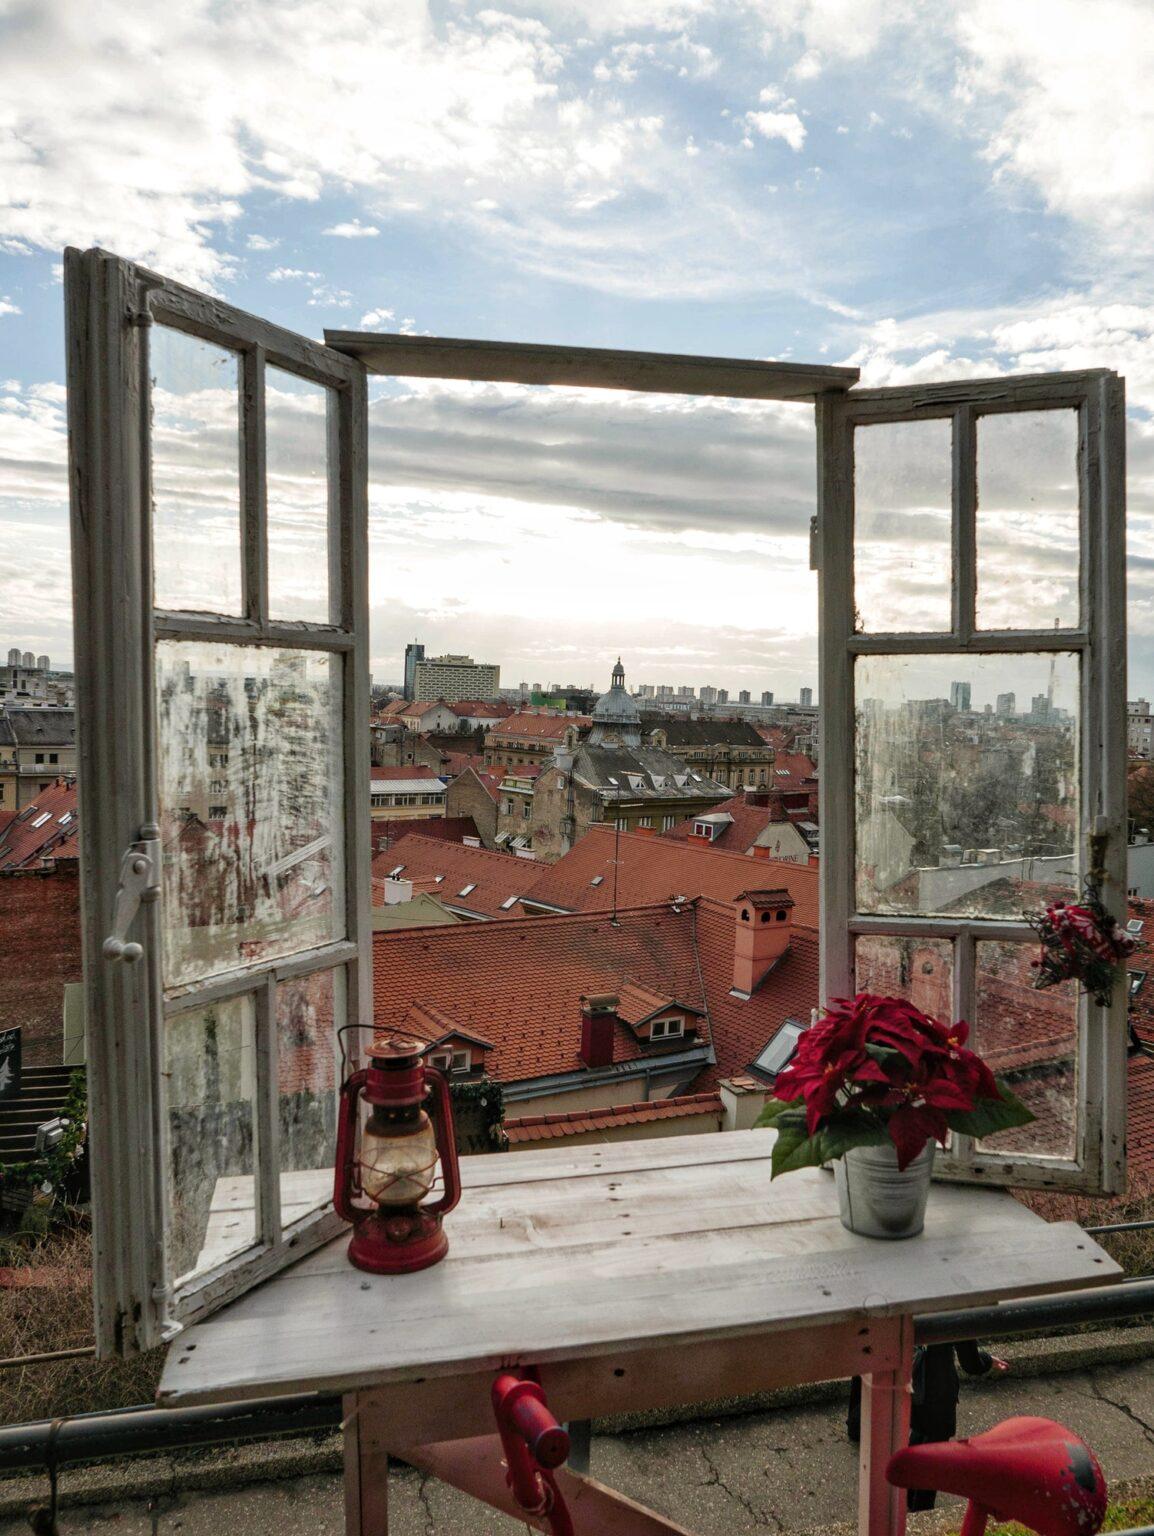 Window overlooking the city. Zagreb, Croatia. Winter, december, christmas.